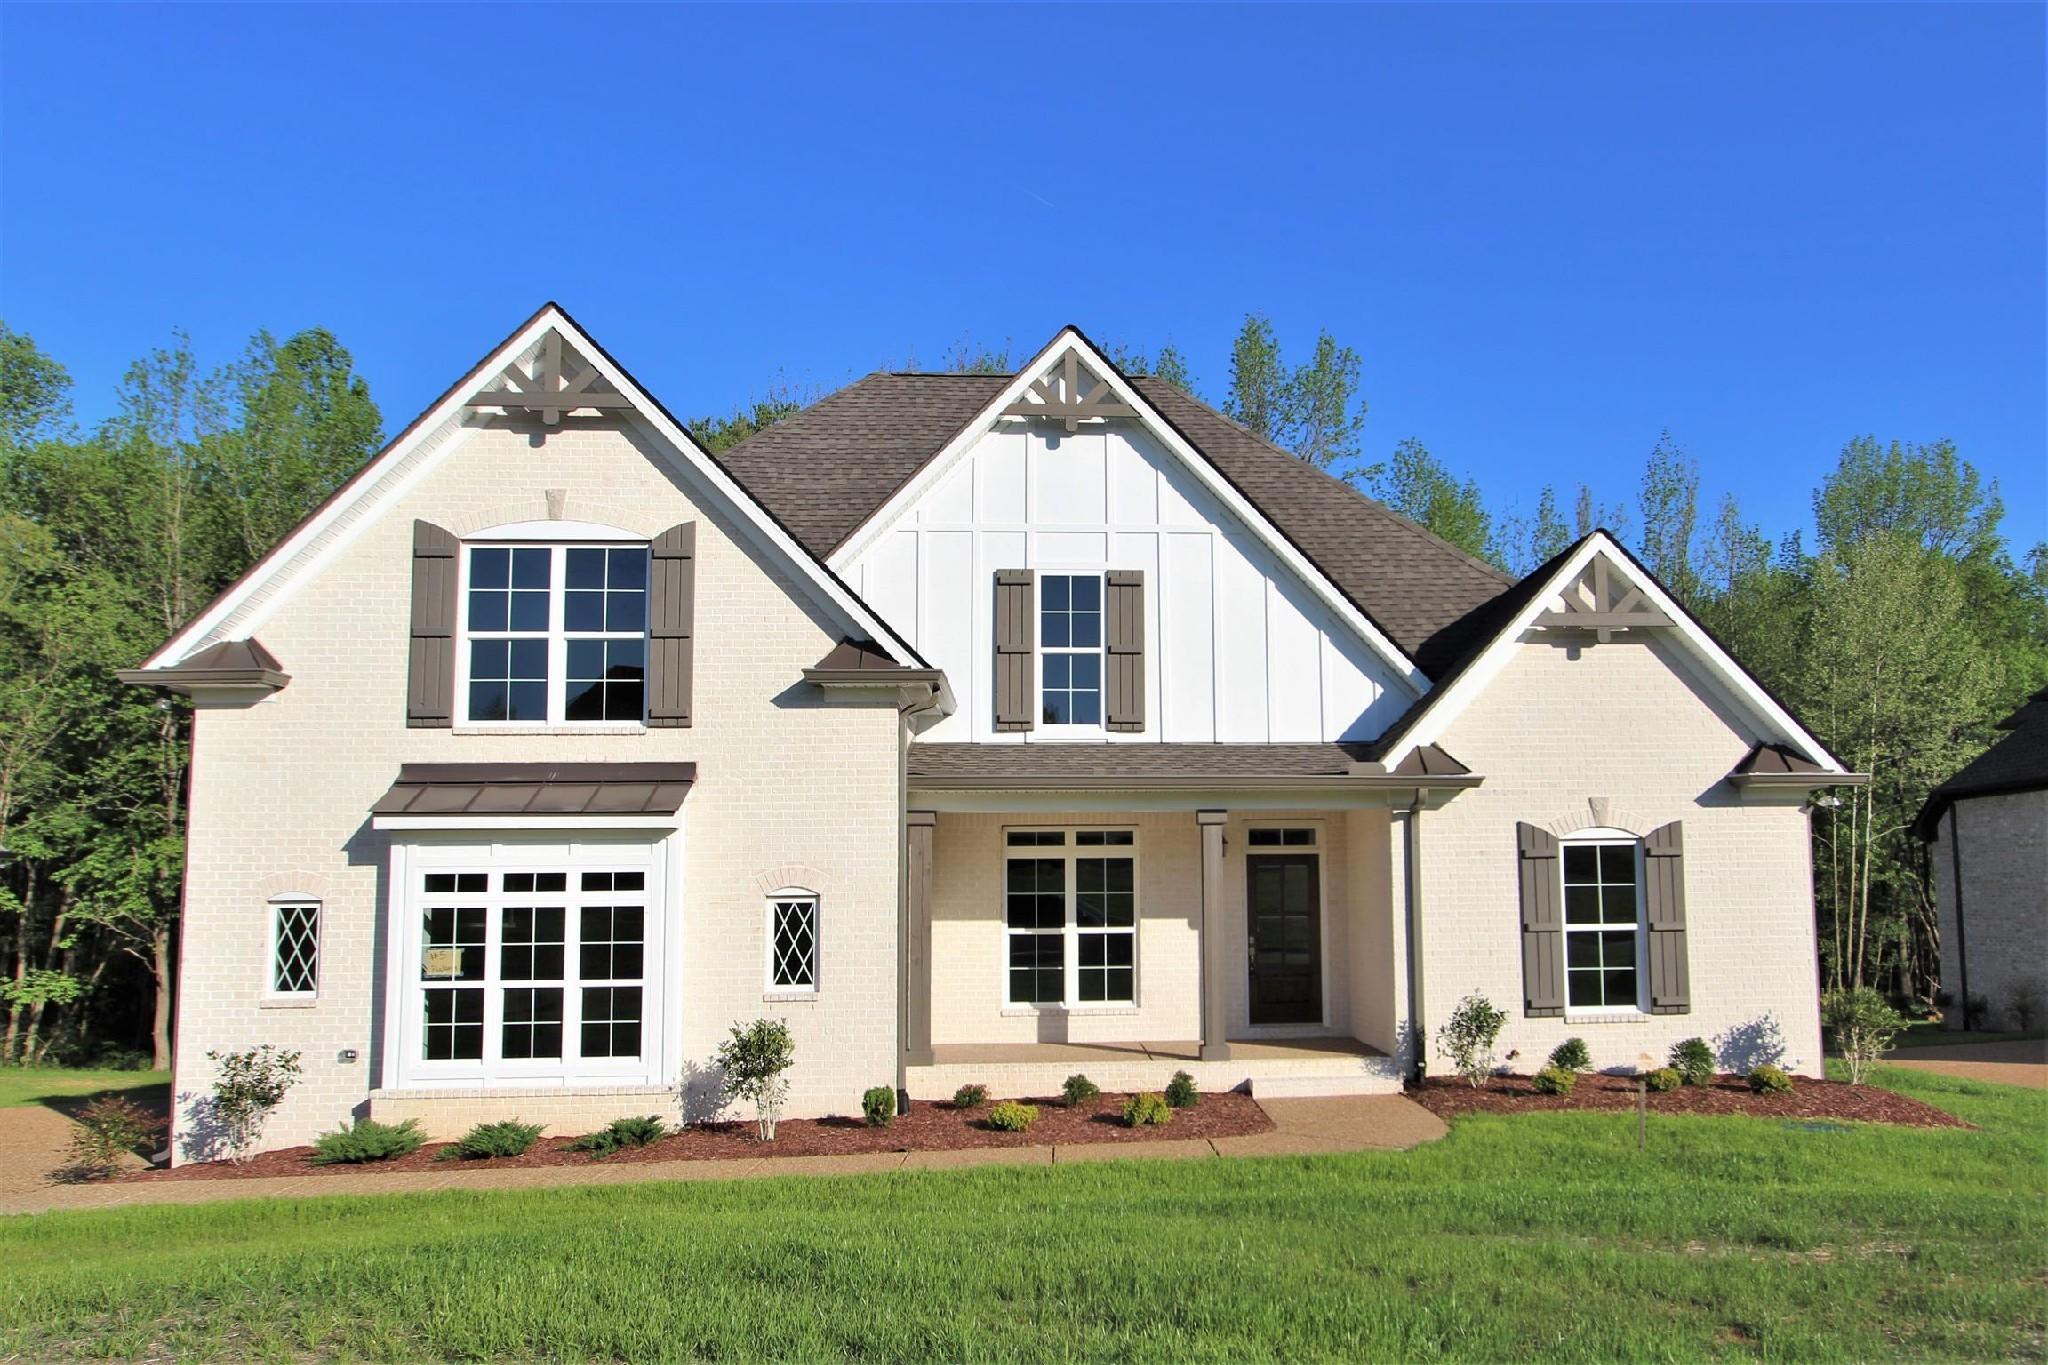 110 Brixton Ridge #5, Lebanon, TN 37087 - Lebanon, TN real estate listing